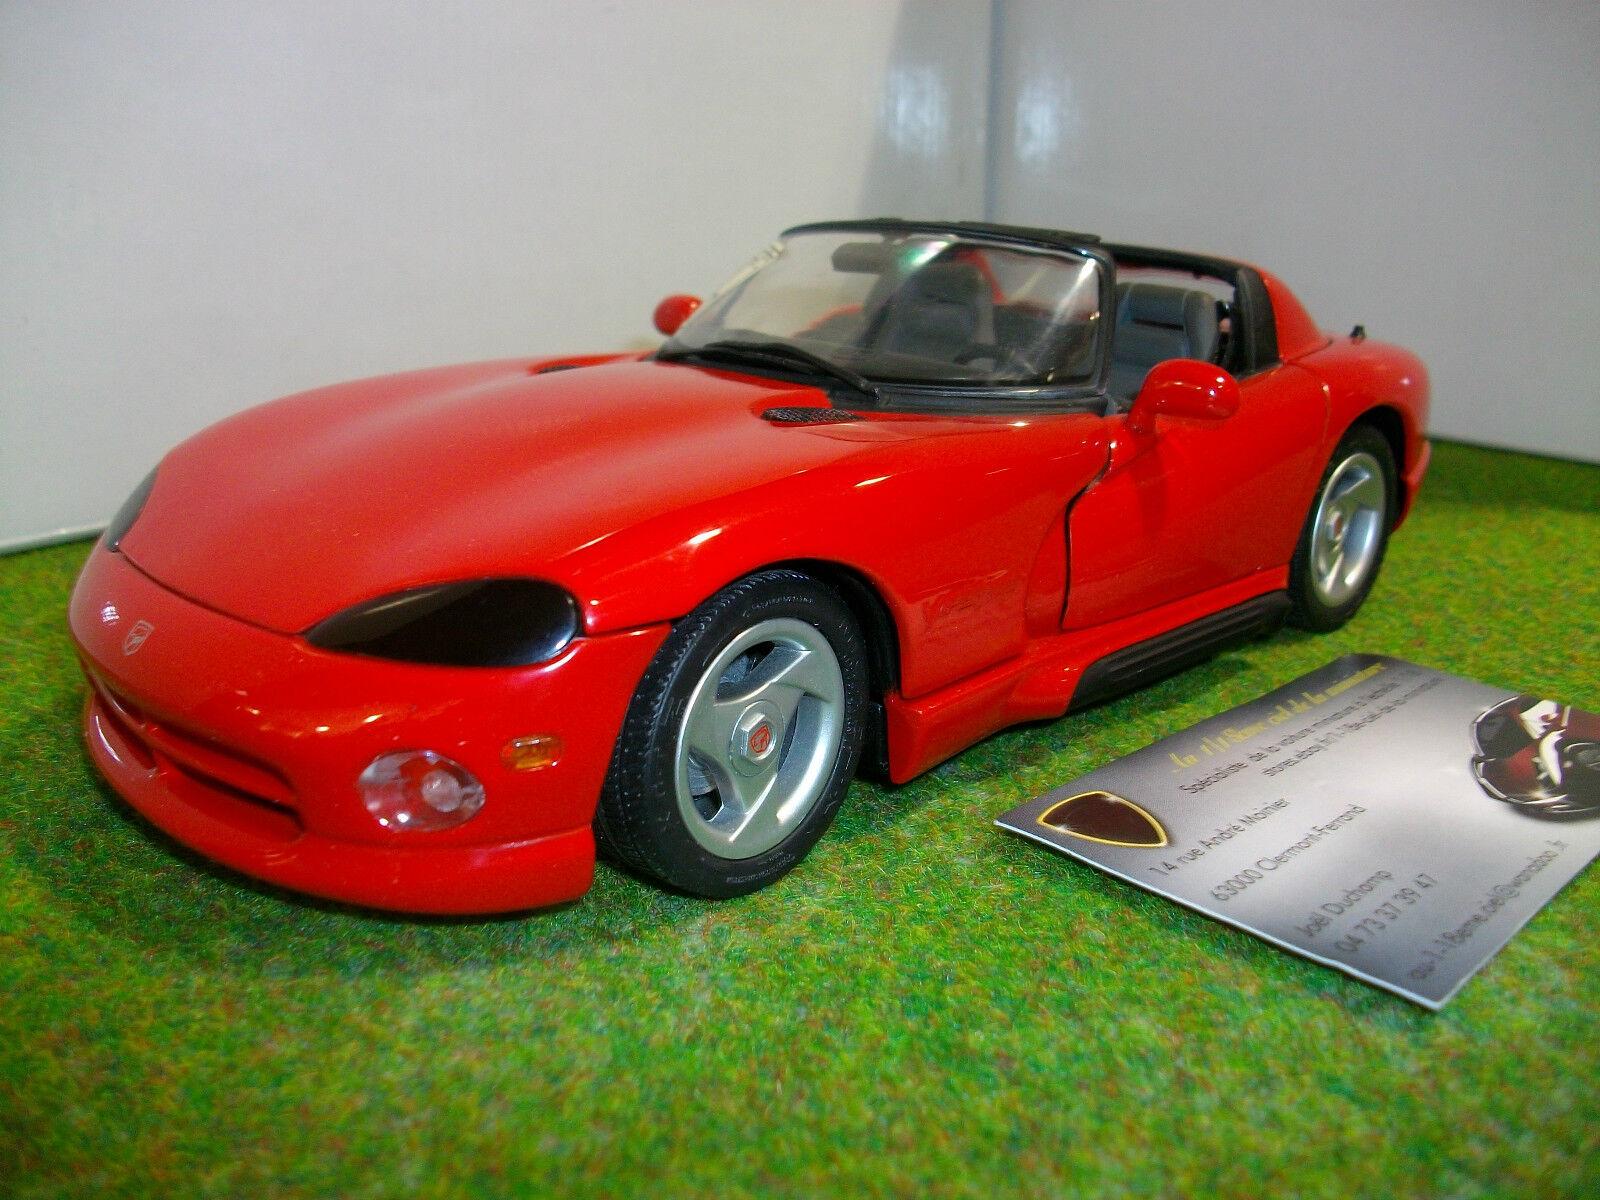 DODGE VIPER RT 10 cabriolet 1 20 CREATIVE MASTER REVELL 08672 voiture miniature